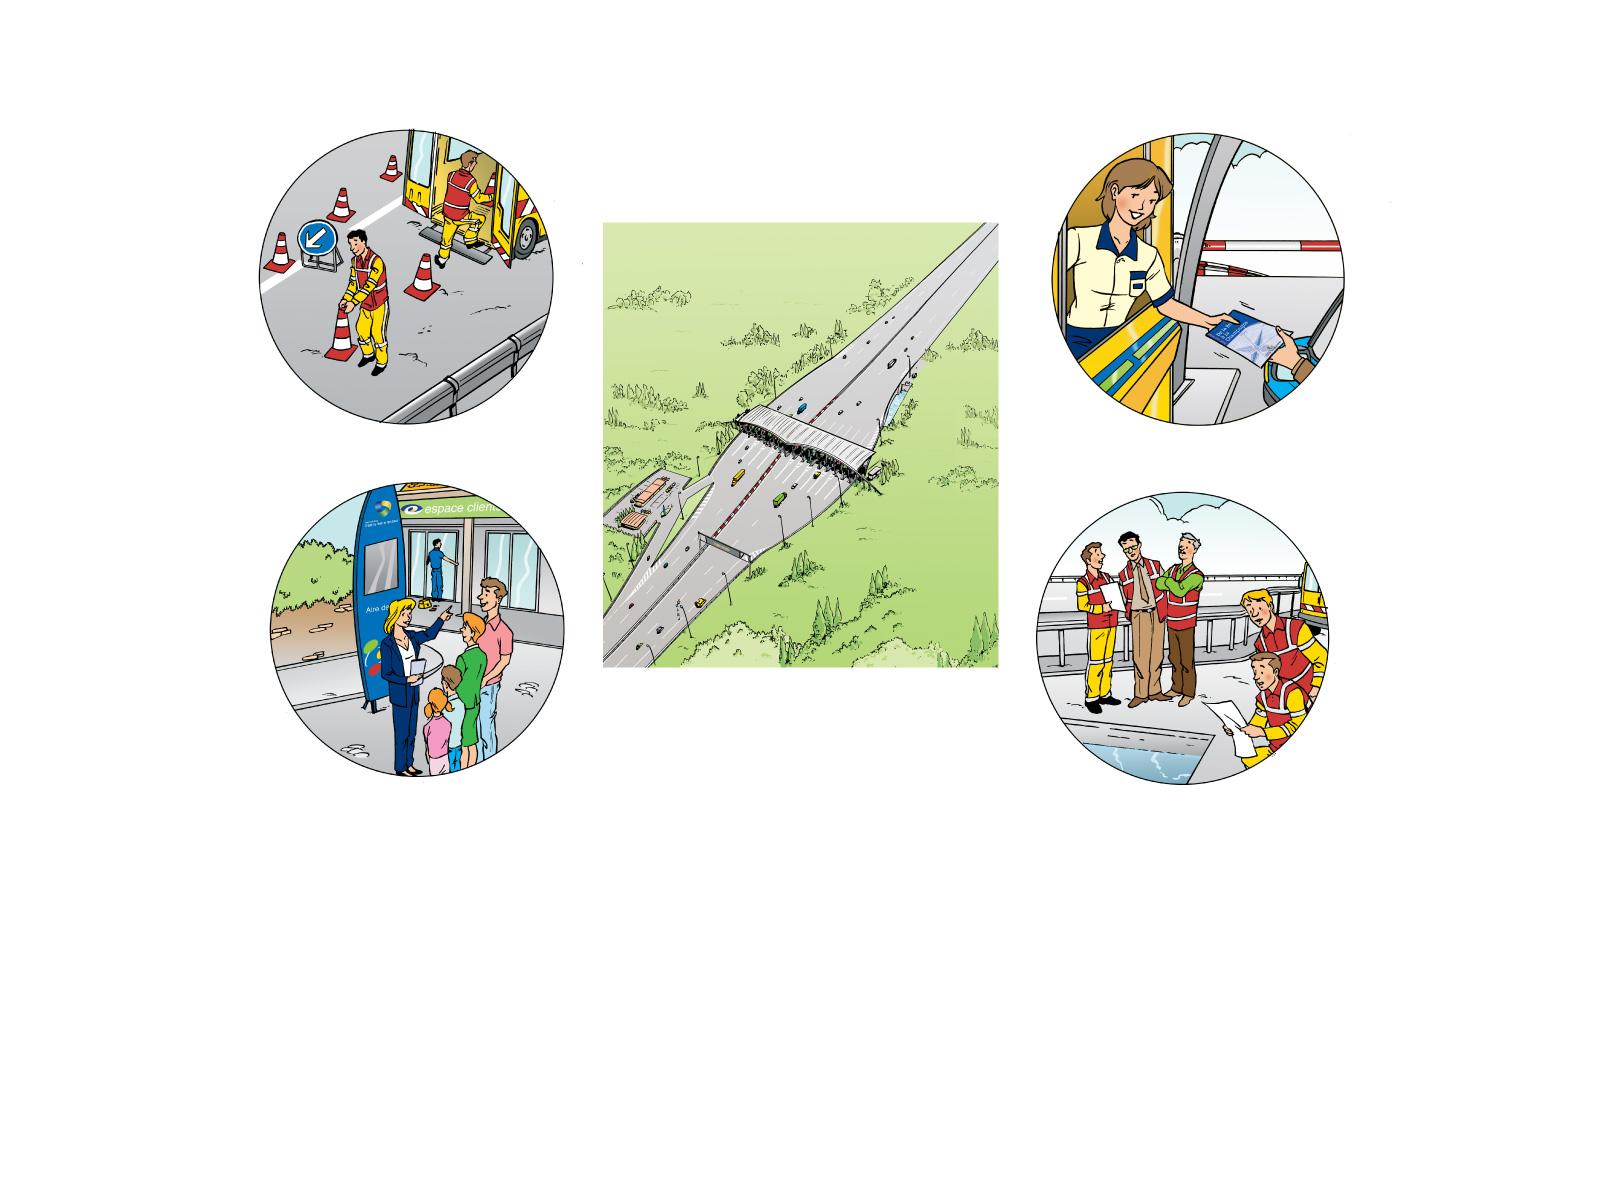 LEDISCOTOlivier-Illustrations-EDITIONS-3131